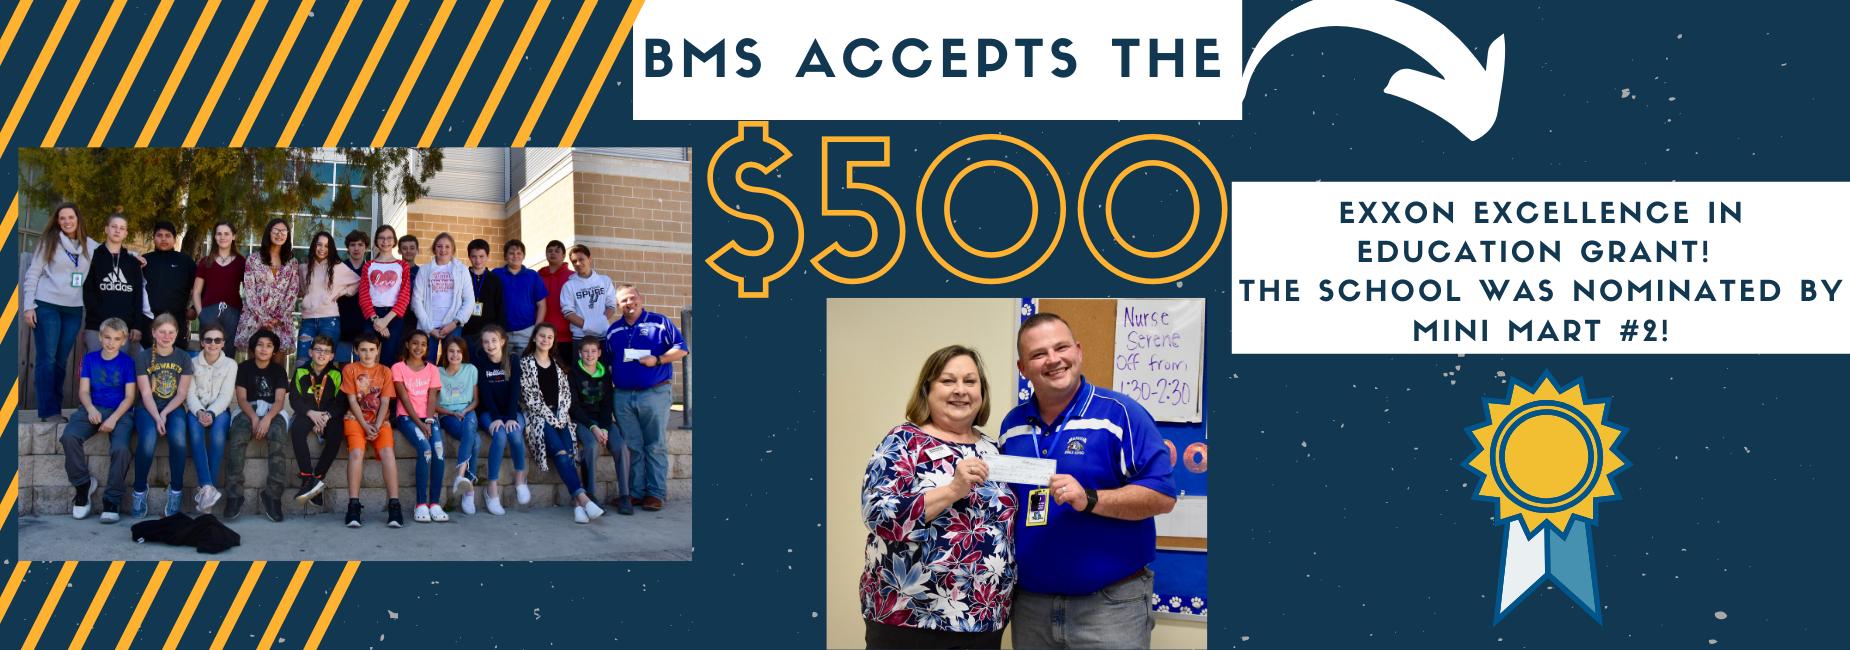 BMS grant award